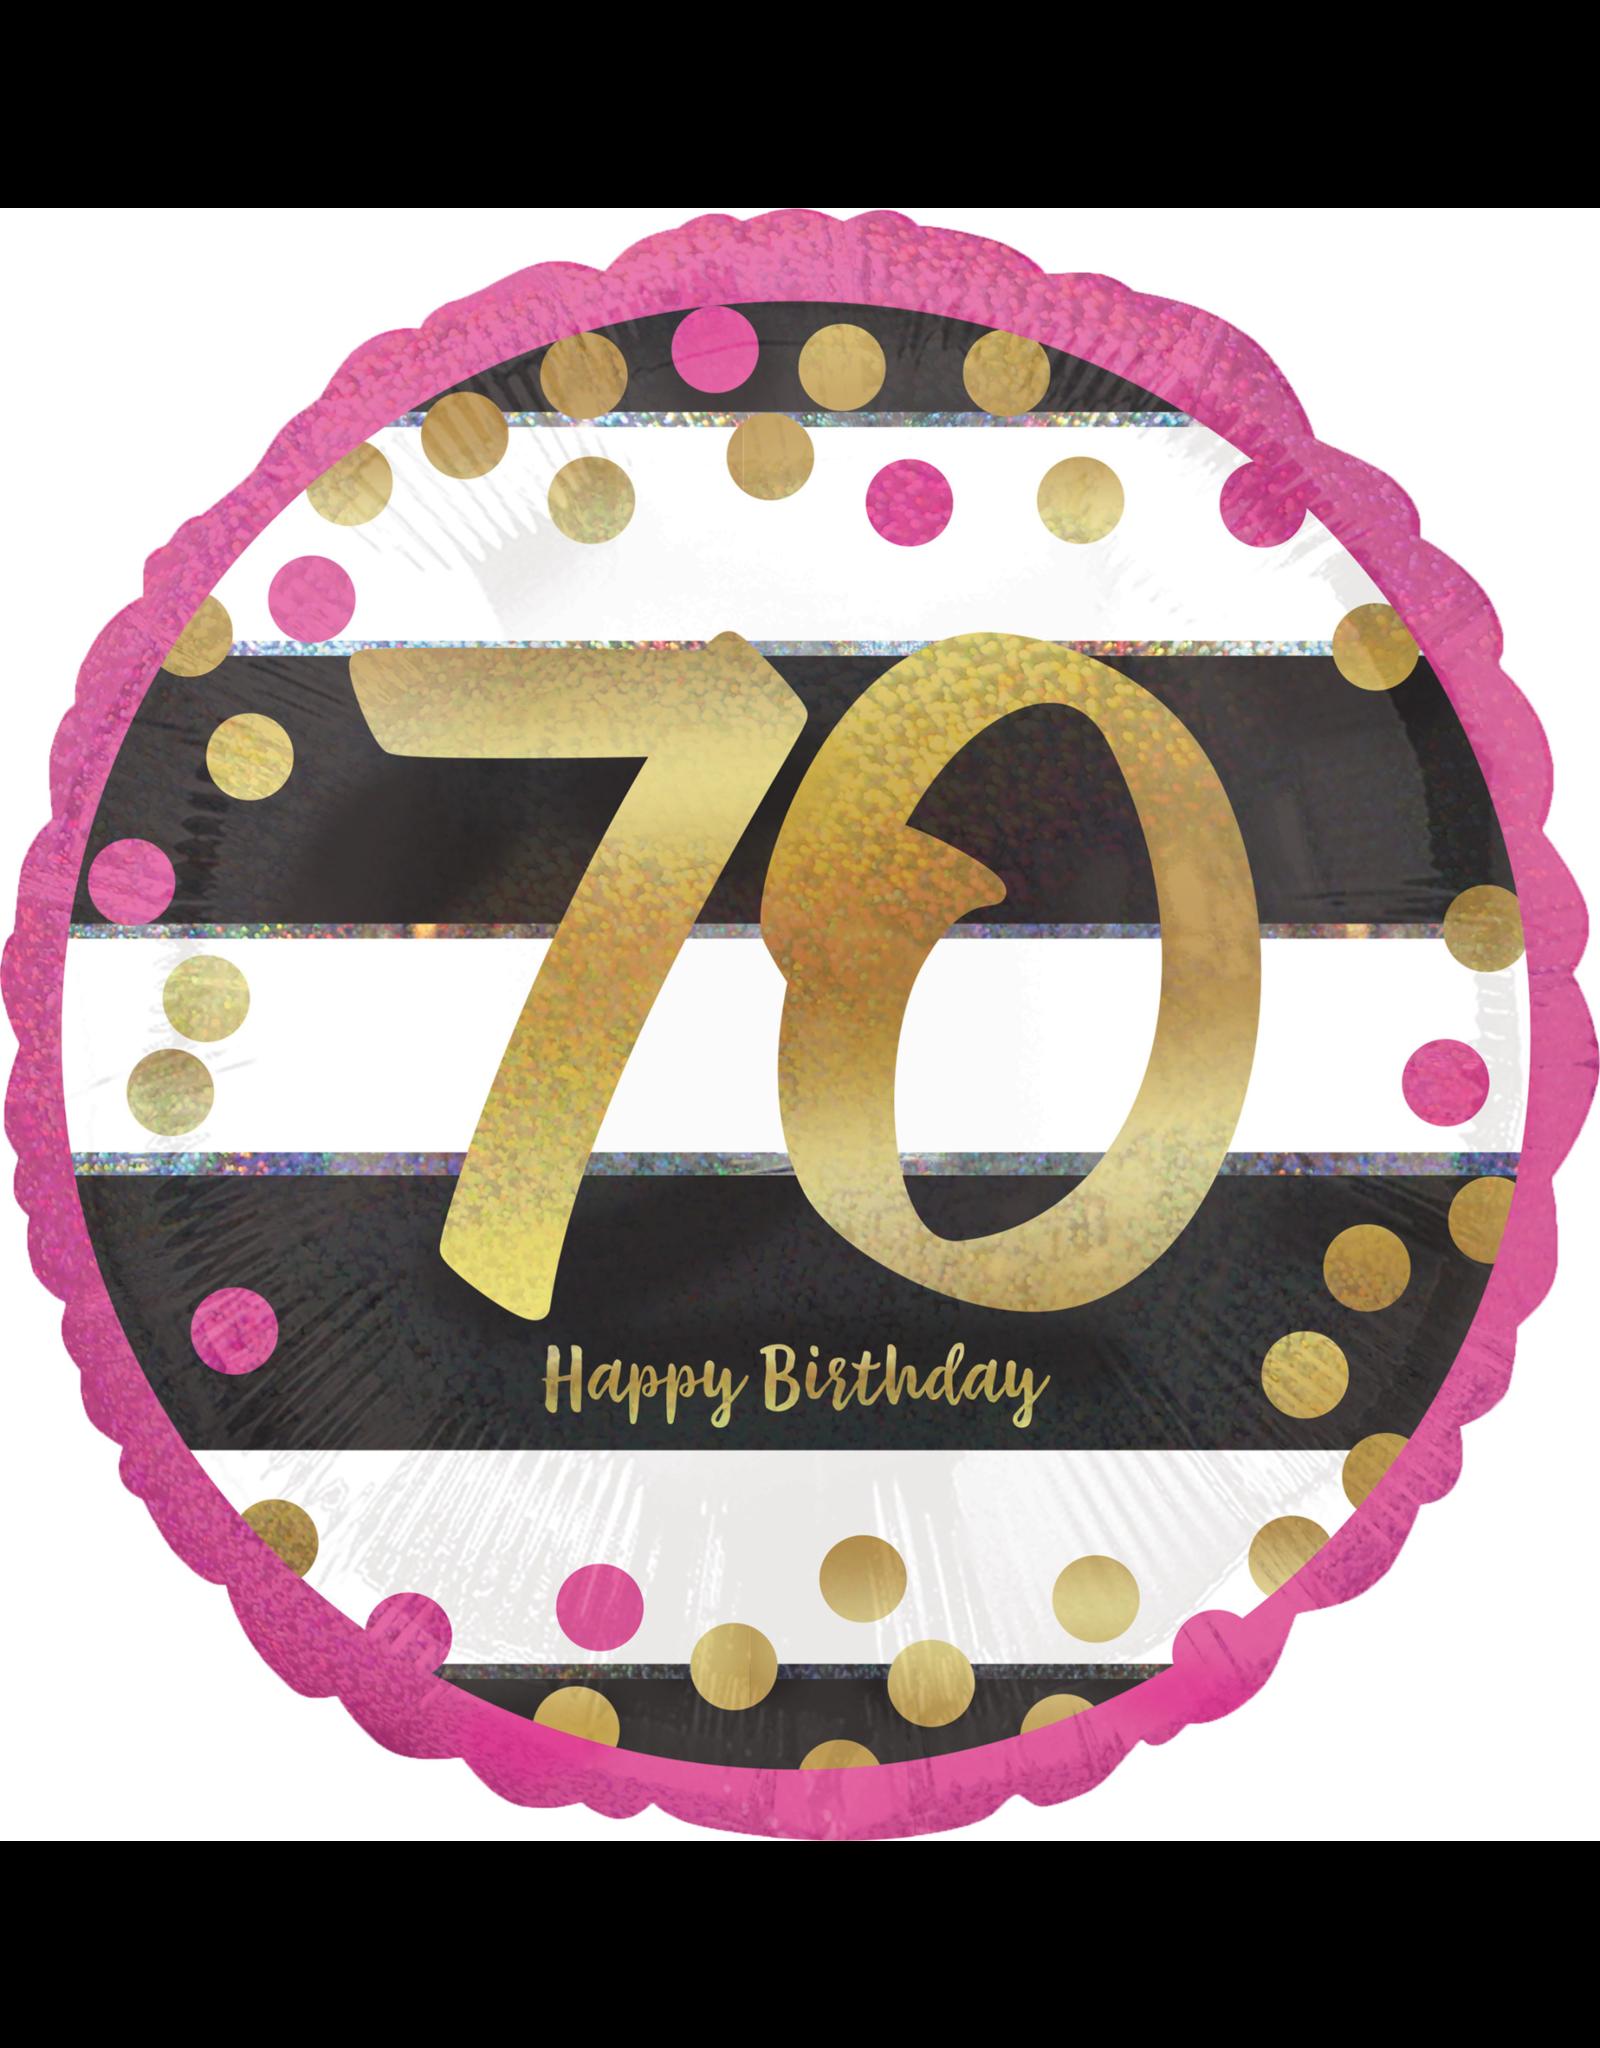 Amscan folieballon pink&gold 70 jaar 45 cm